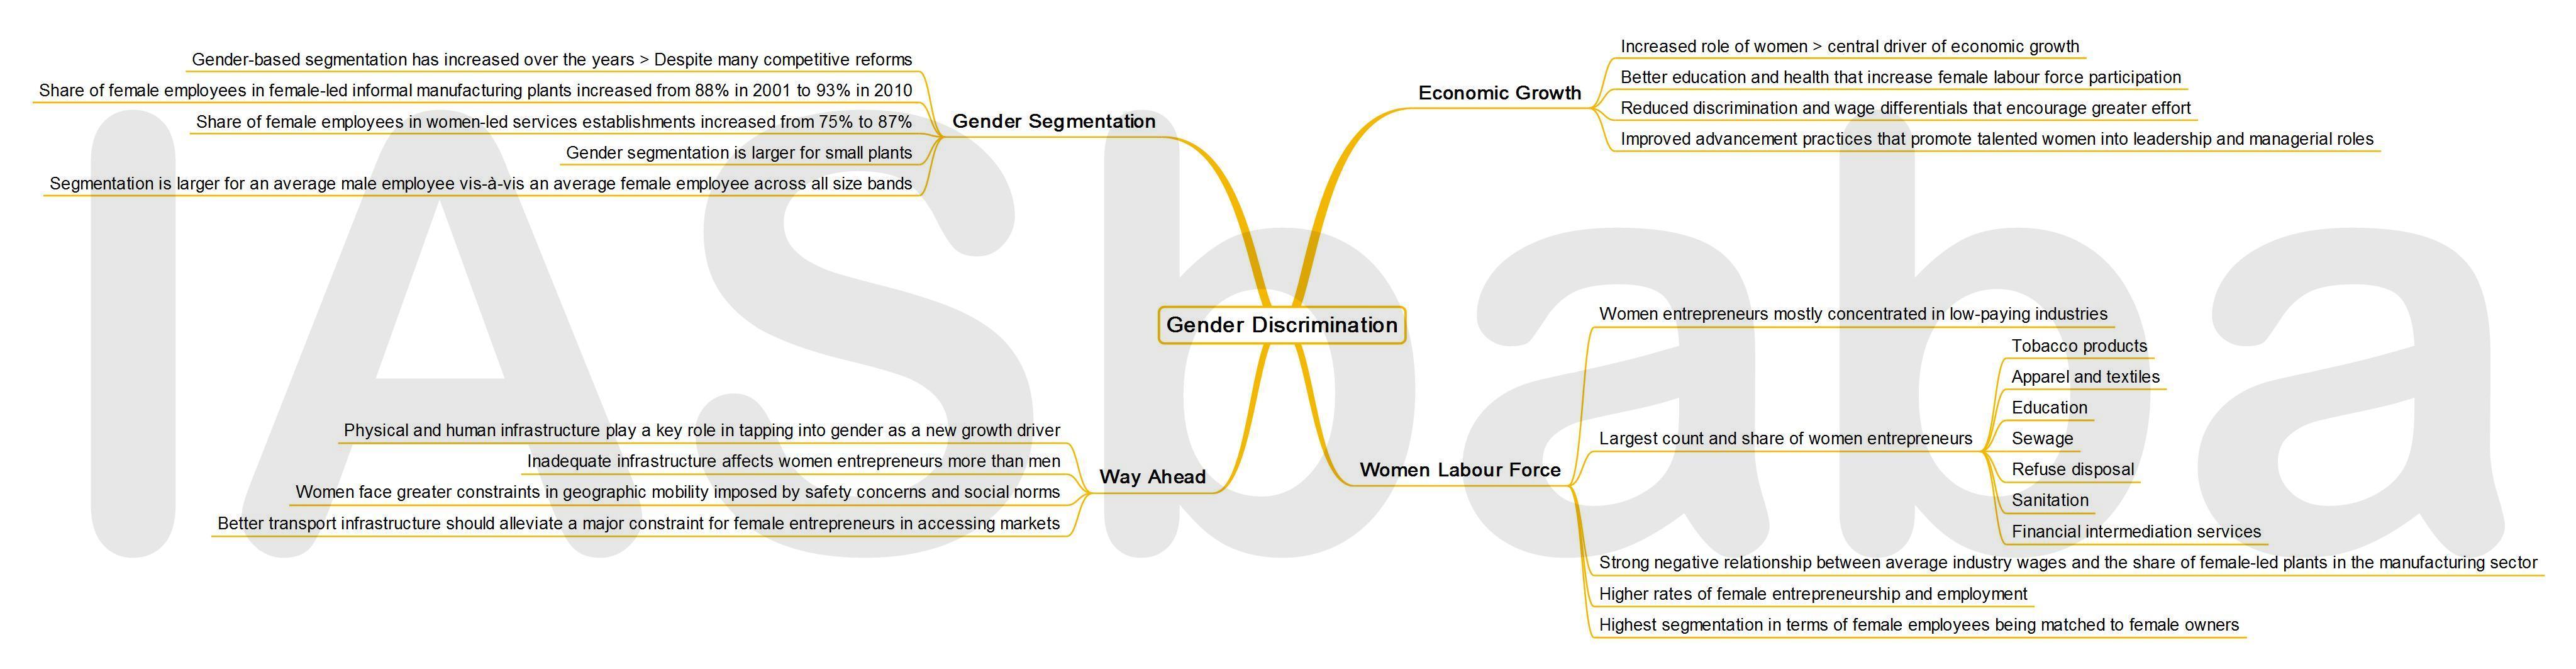 IASbaba's MINDMAP : Issue - Gender Discrimination